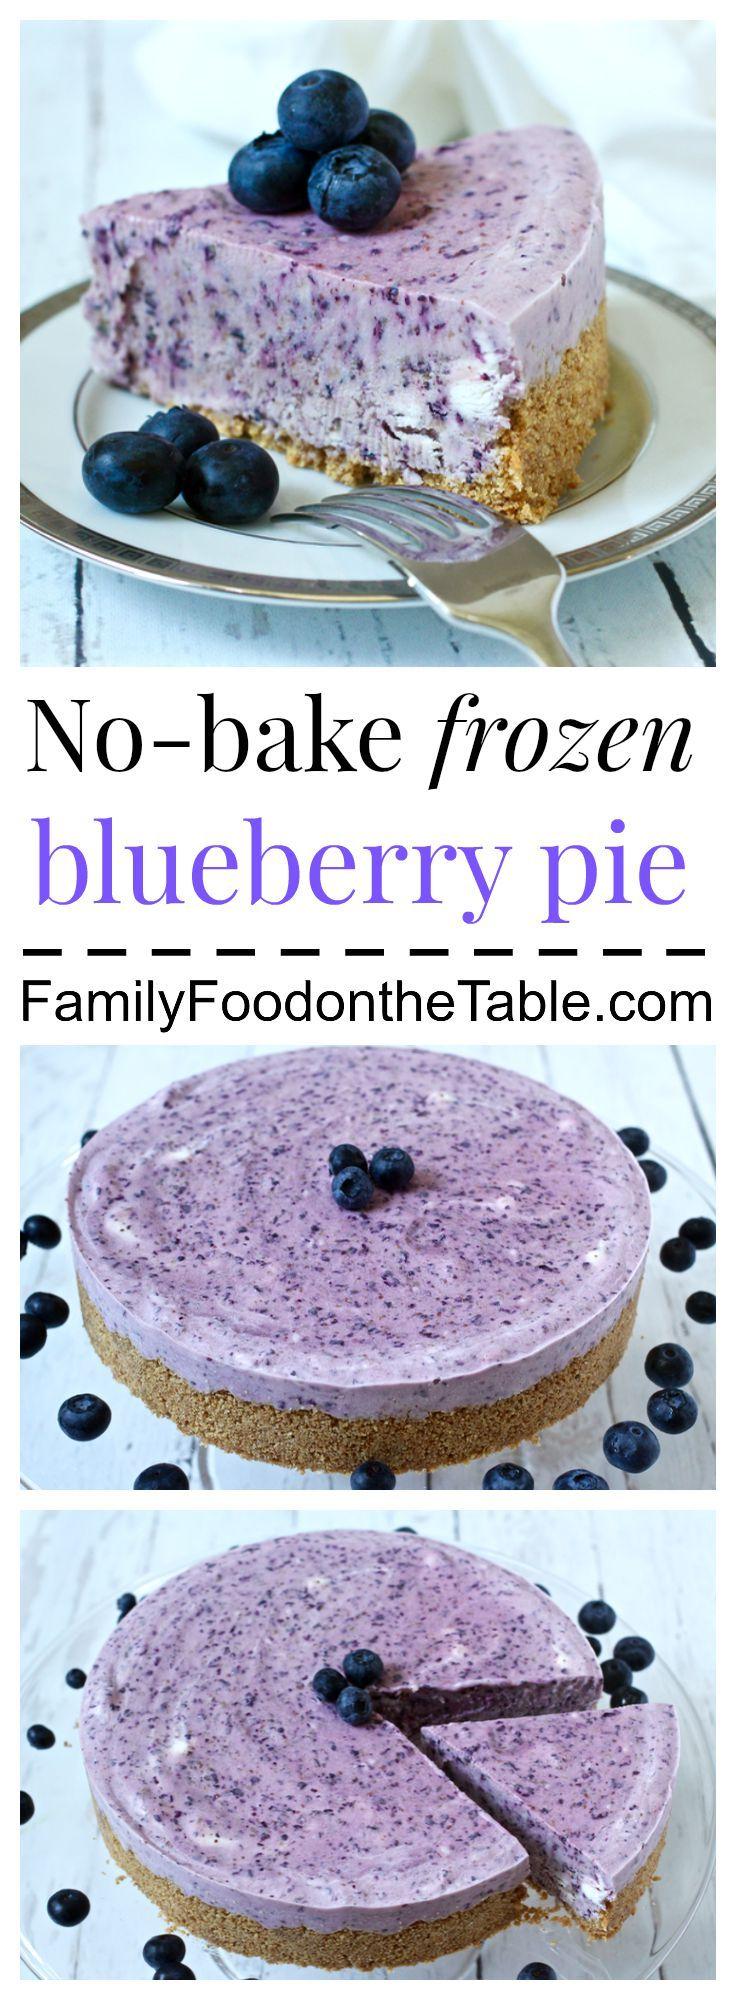 A creamy, no-bake frozen blueberry pie, perfect for summer! | FamilyFoodontheTable.com